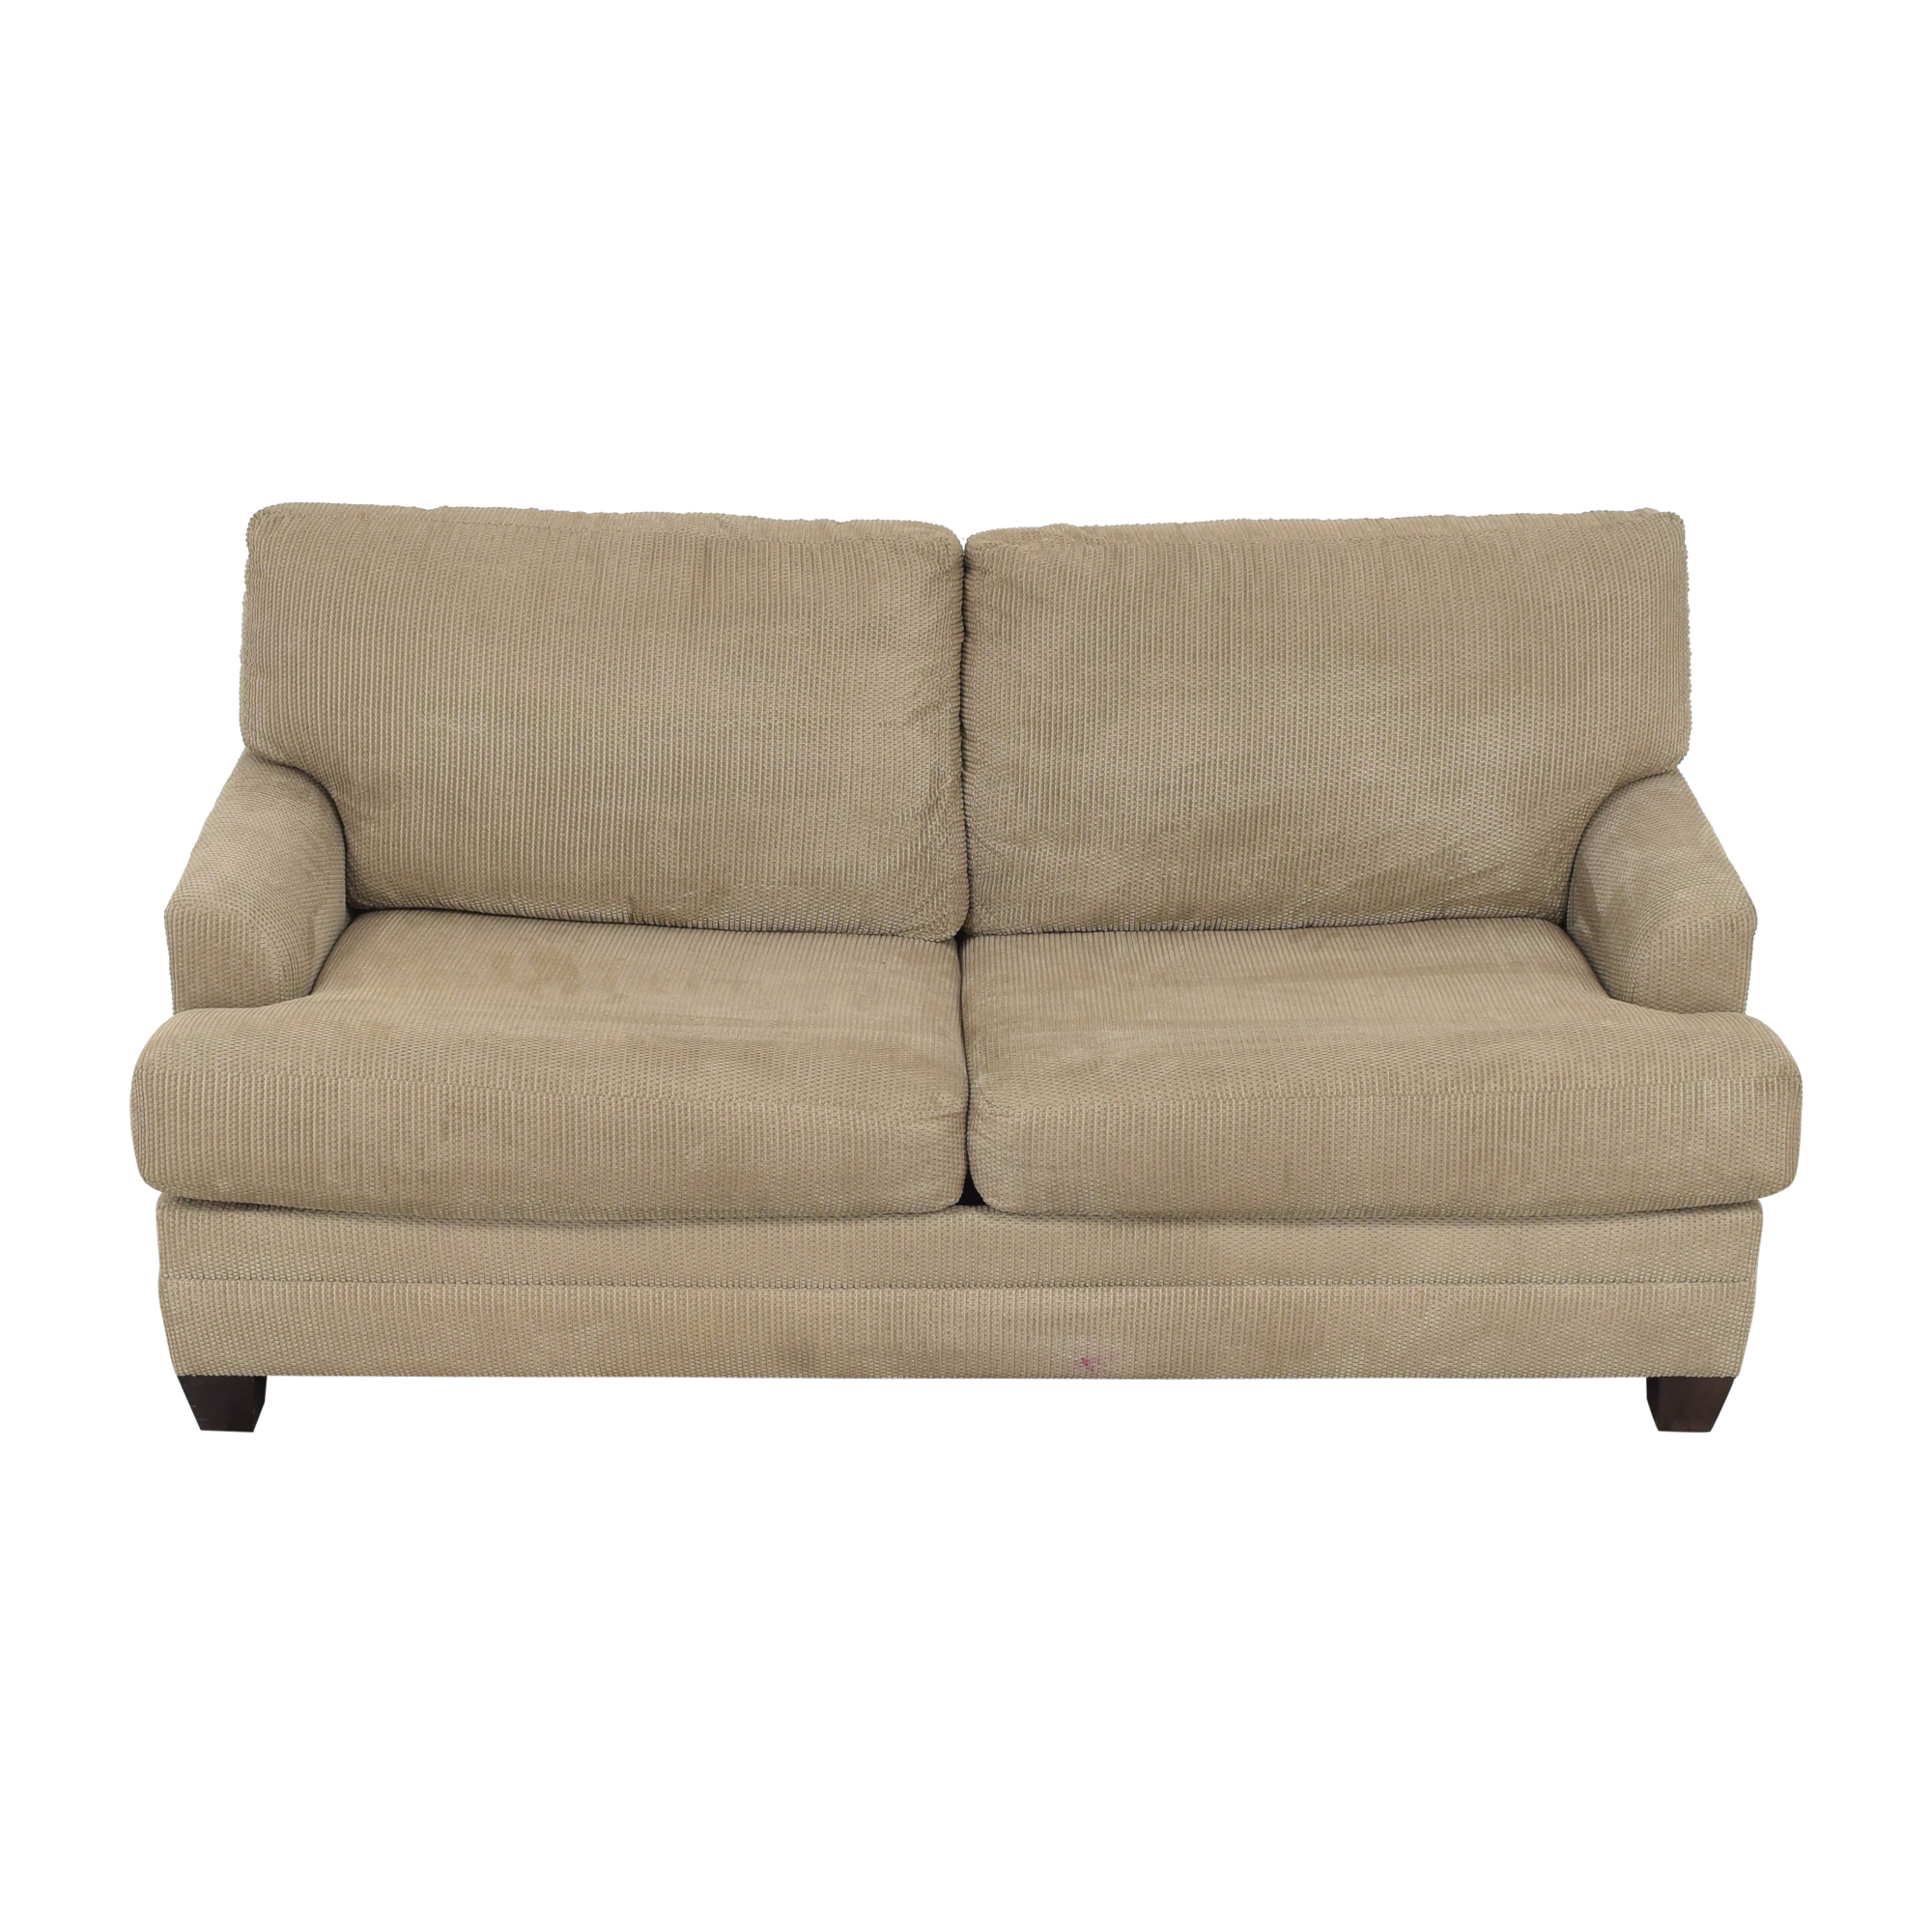 Bassett CU.2 Full Sleeper Sofa / Sofa Beds